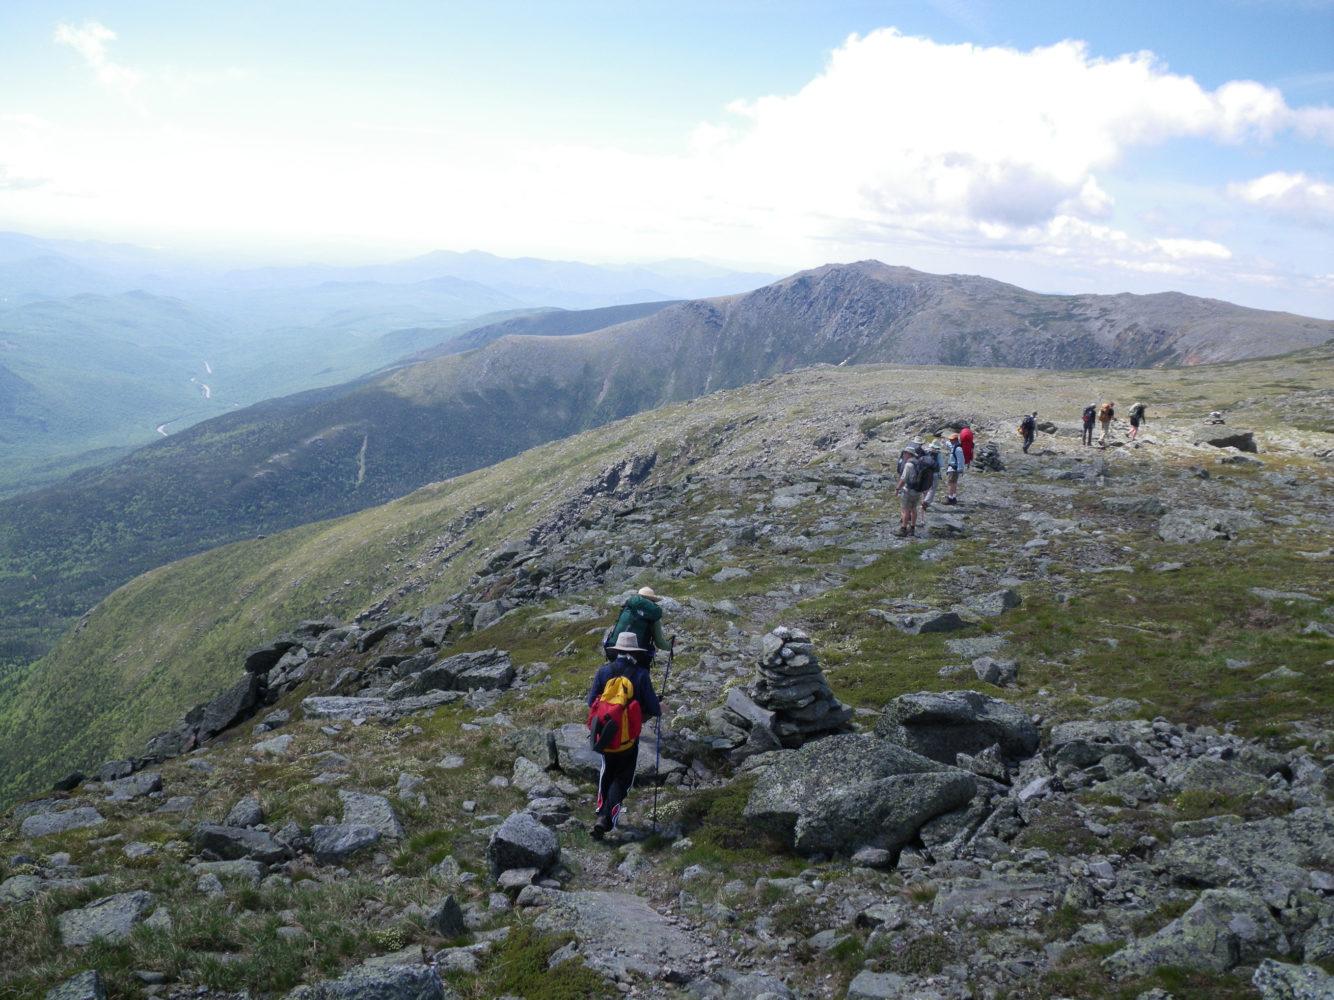 Auf dem Mount Washington kurz vor dem Gipfel / Bild: Appalachian Mountain Club